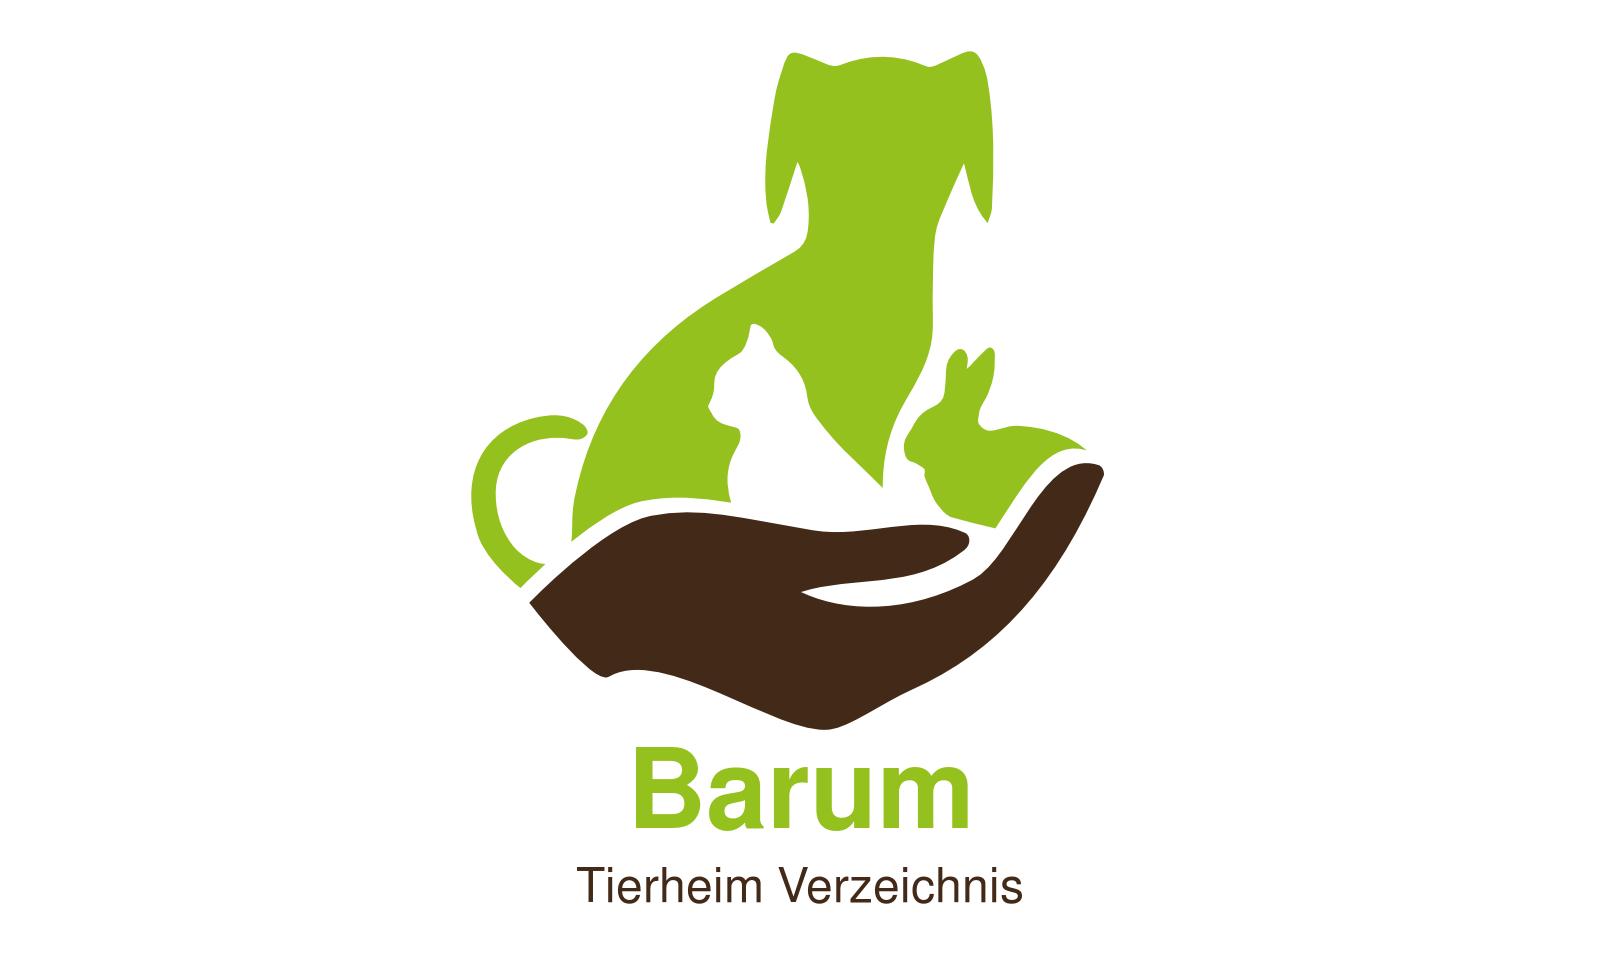 Tierheim Barum